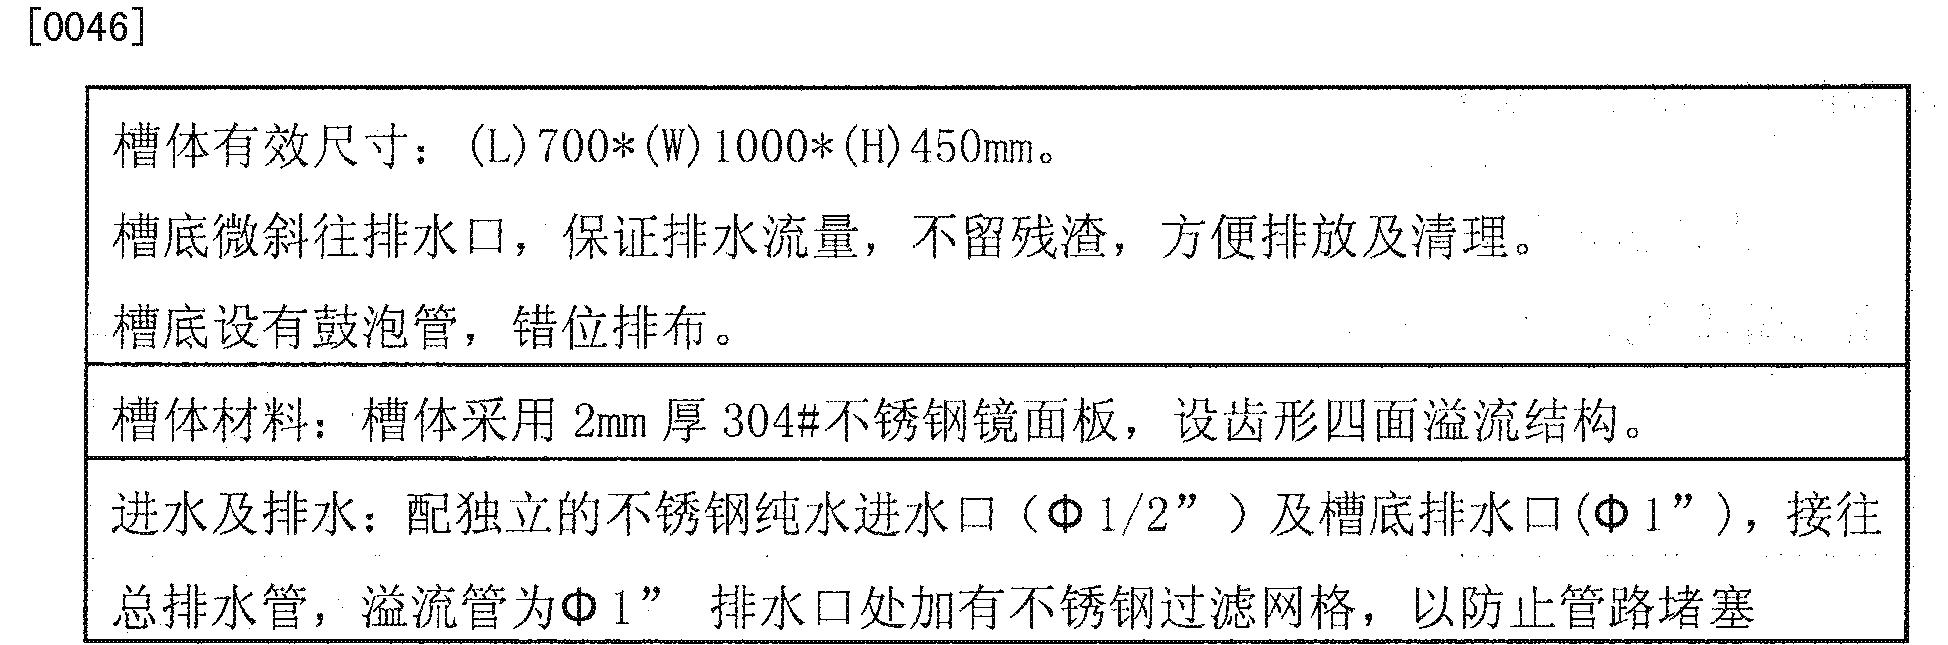 Figure CN204035120UD00112